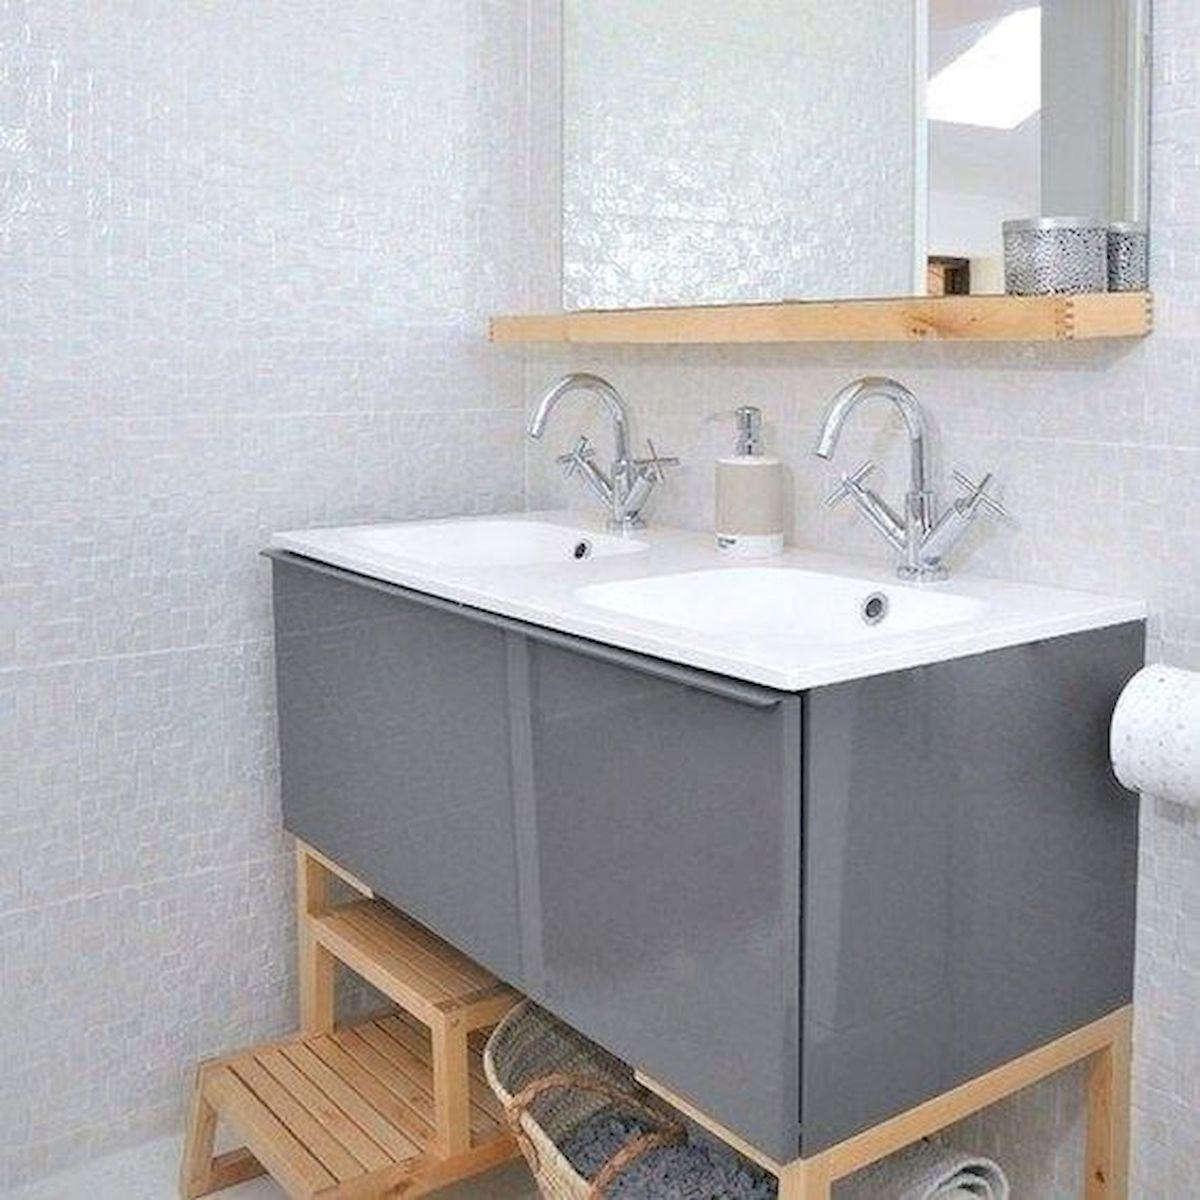 26 Easy and Creative DIY Mirror Ideas To Decorate Your Bathroom (4)